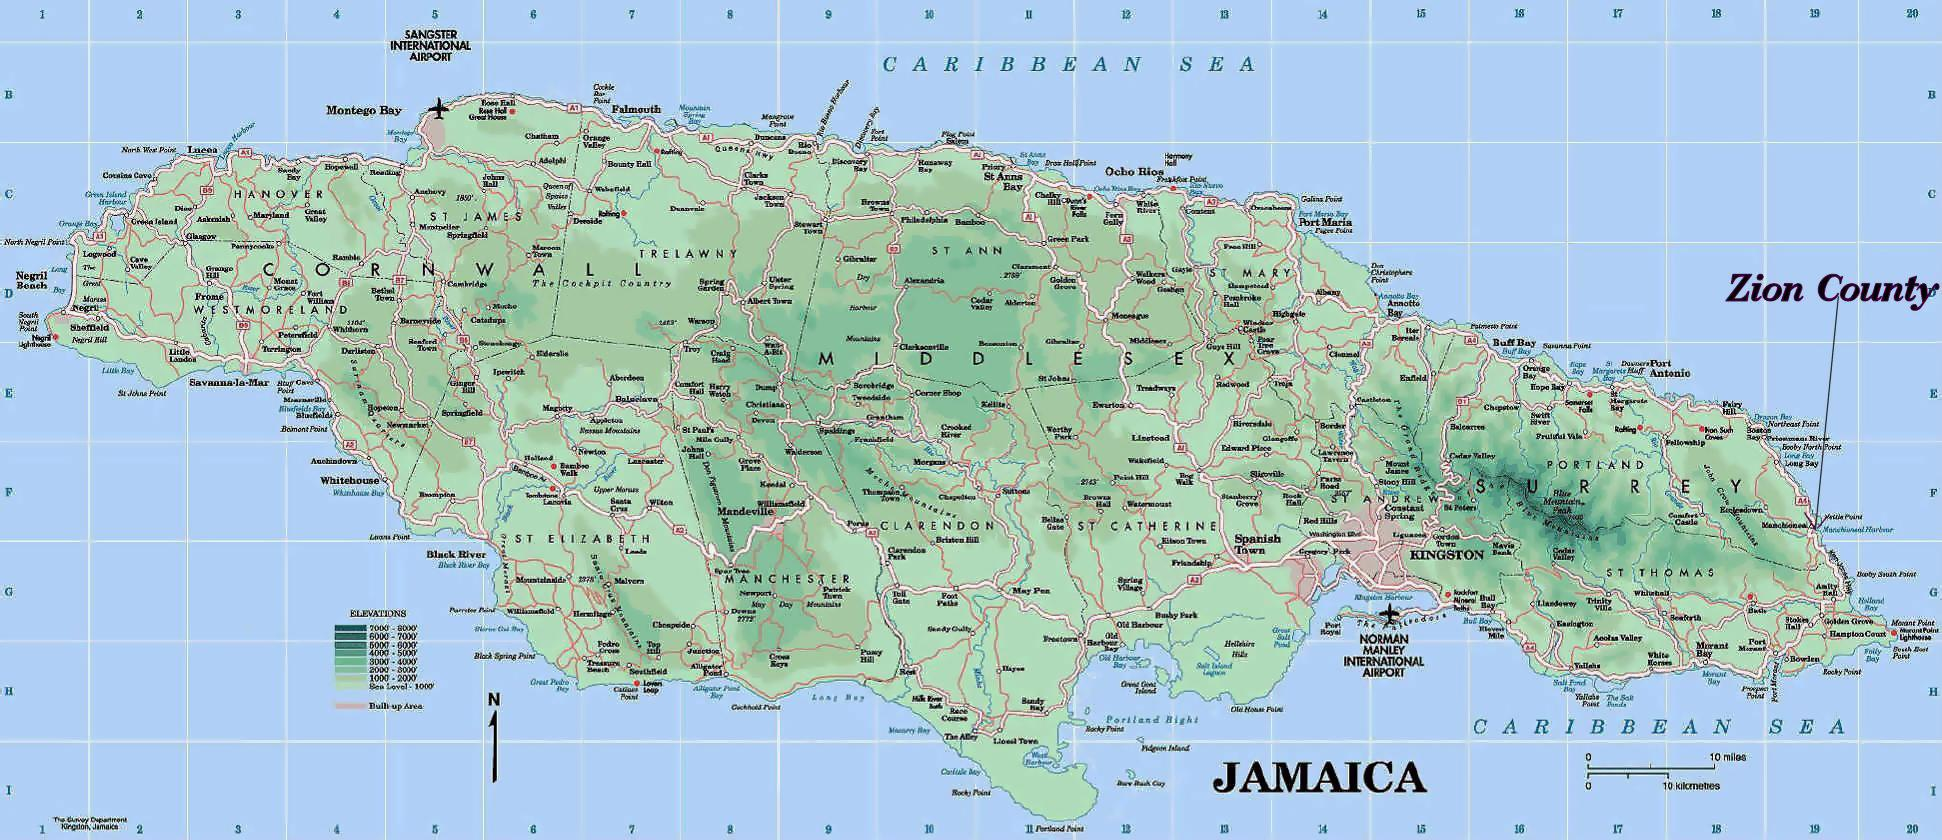 Fysisk Kort Af Jamaica Fysisk Kort Af Jamaica Som Viser Bjerge